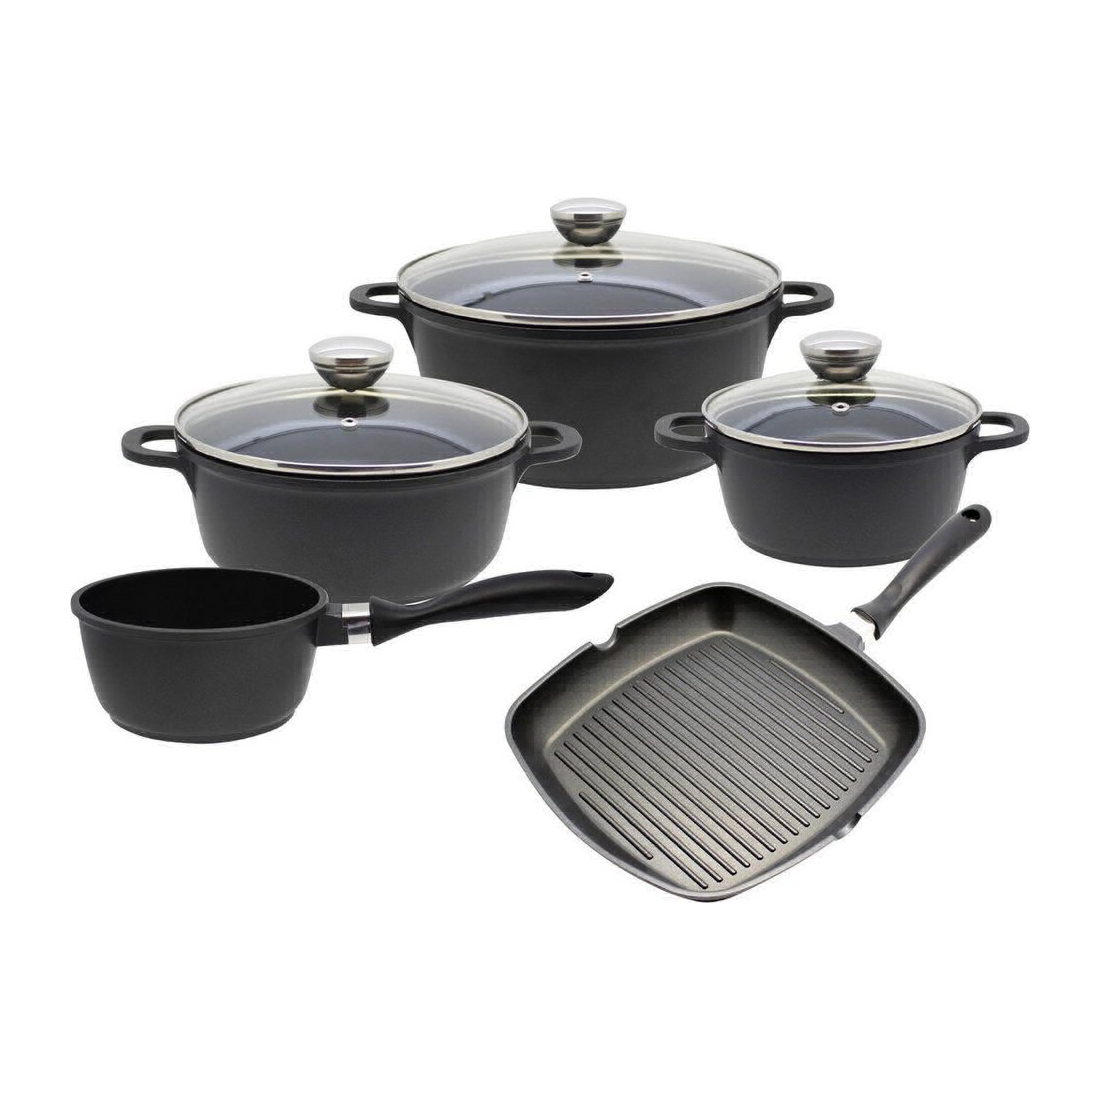 Набор посуды Elo 8 предметов набор посуды werner ingrid 8 предметов